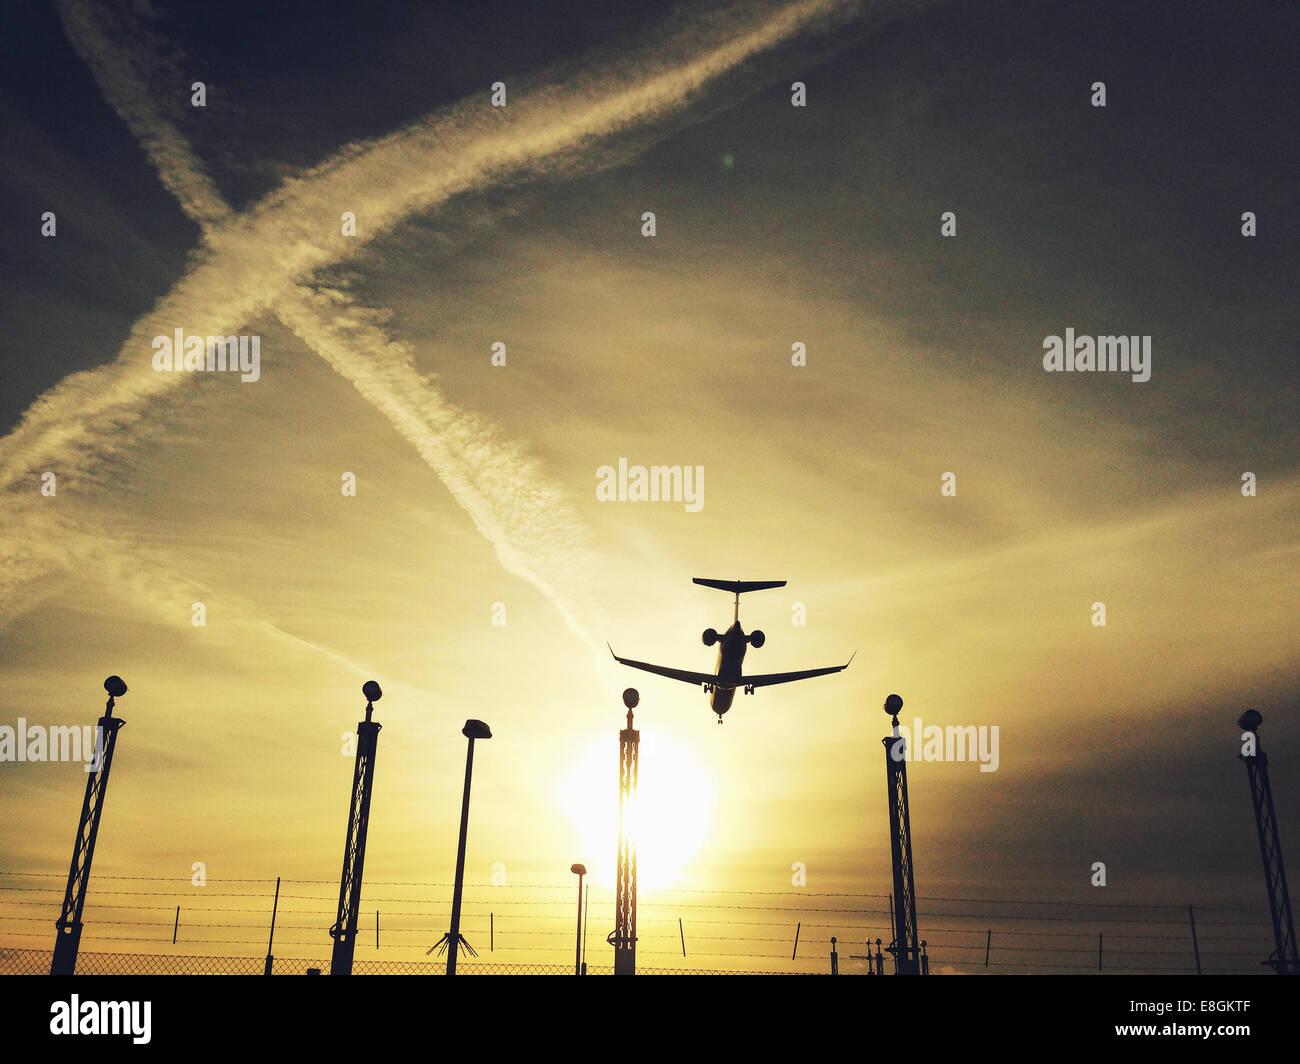 Silhouette of landing airplane - Stock Image